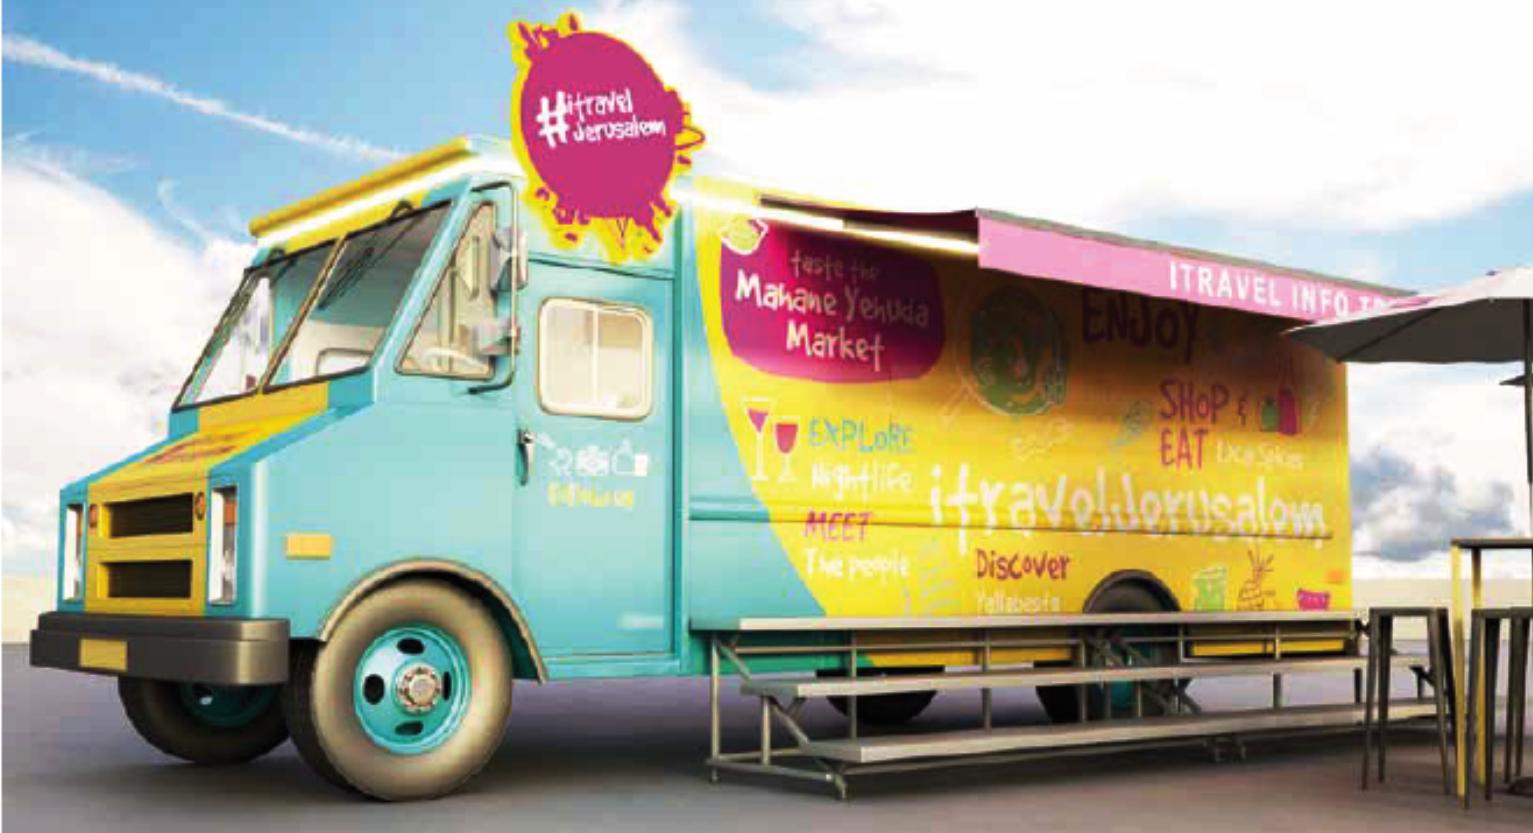 Info trucks, free transport welcome tourists to Jerusalem | ISRAEL21c